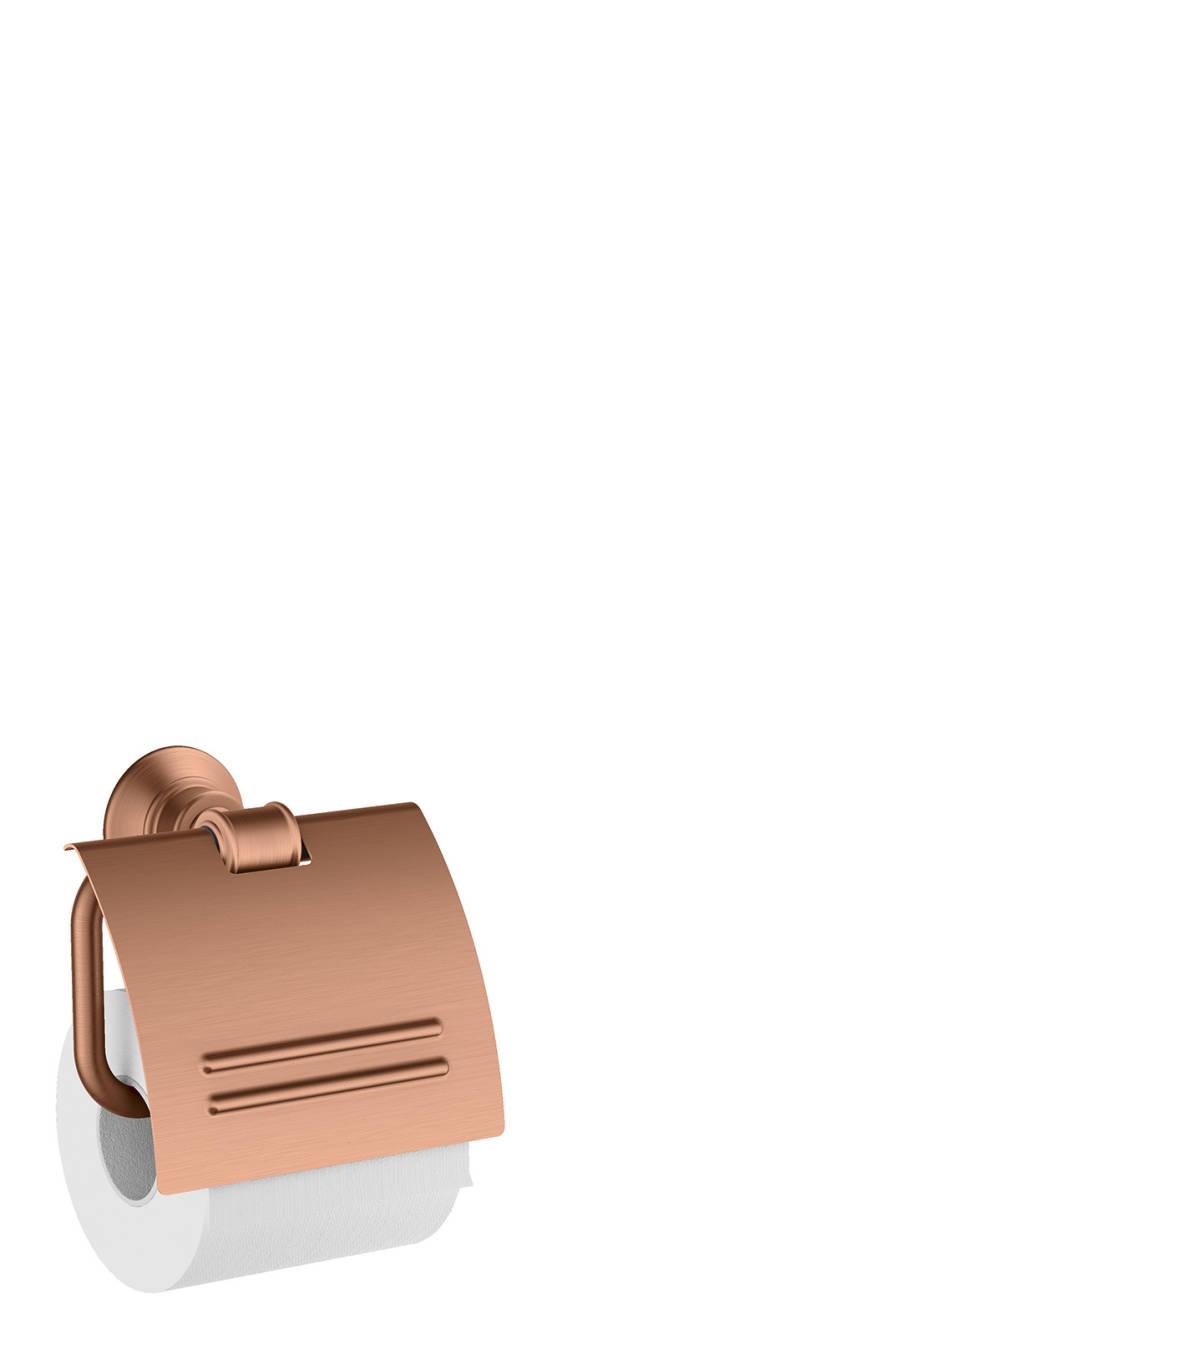 Roll holder, Brushed Red Gold, 42036310